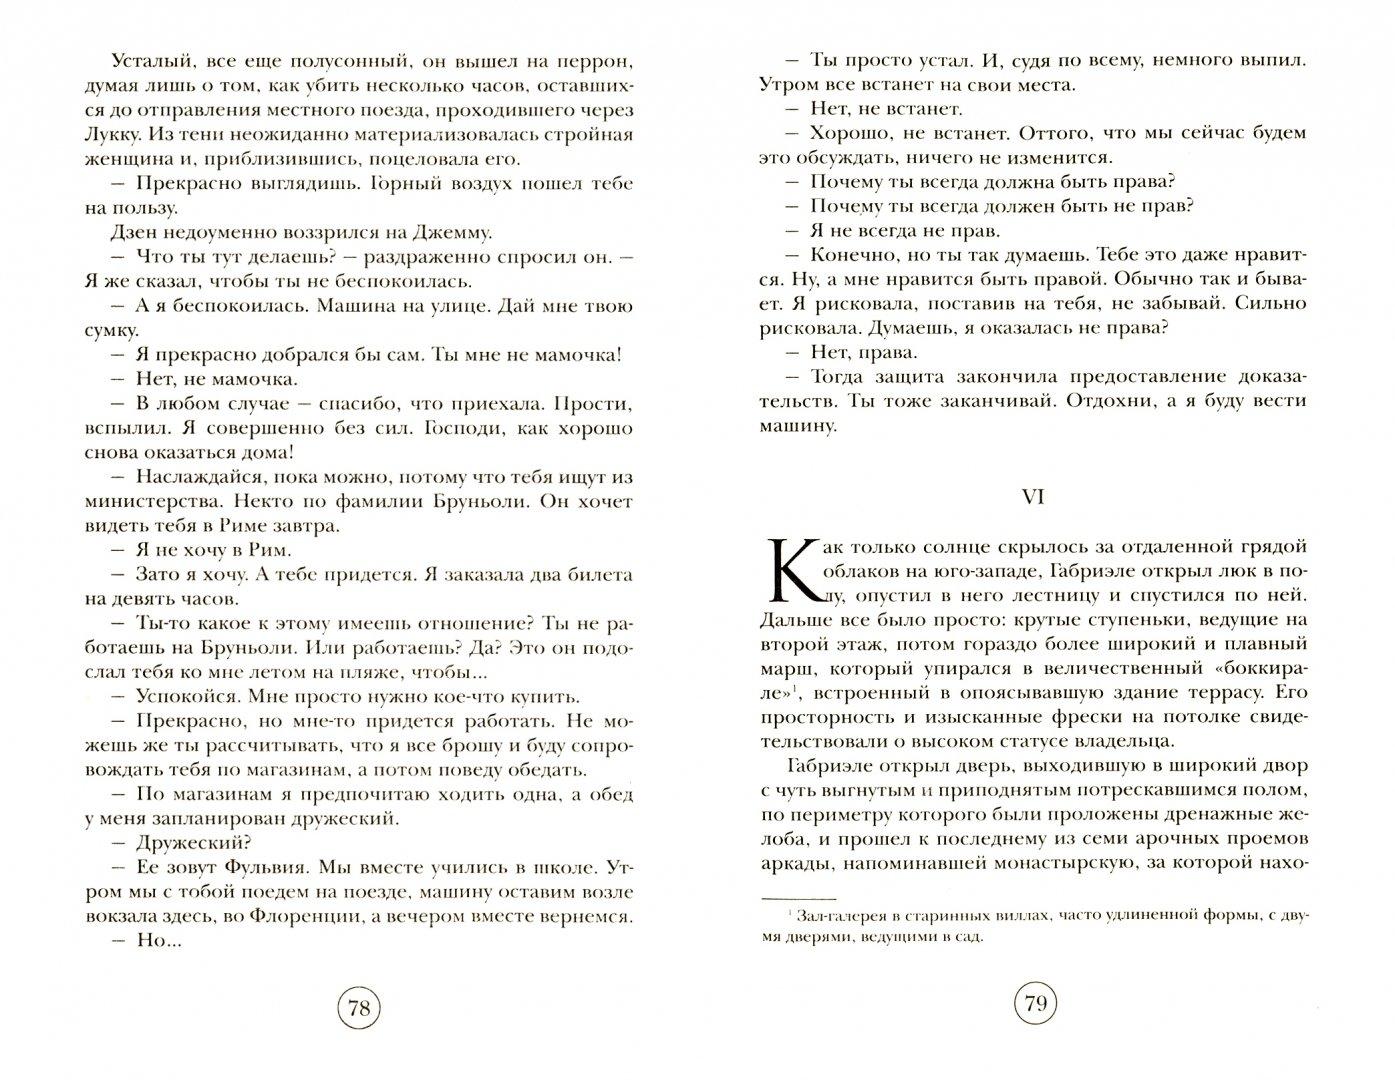 Иллюстрация 1 из 5 для Медуза - Майкл Дибдин   Лабиринт - книги. Источник: Лабиринт